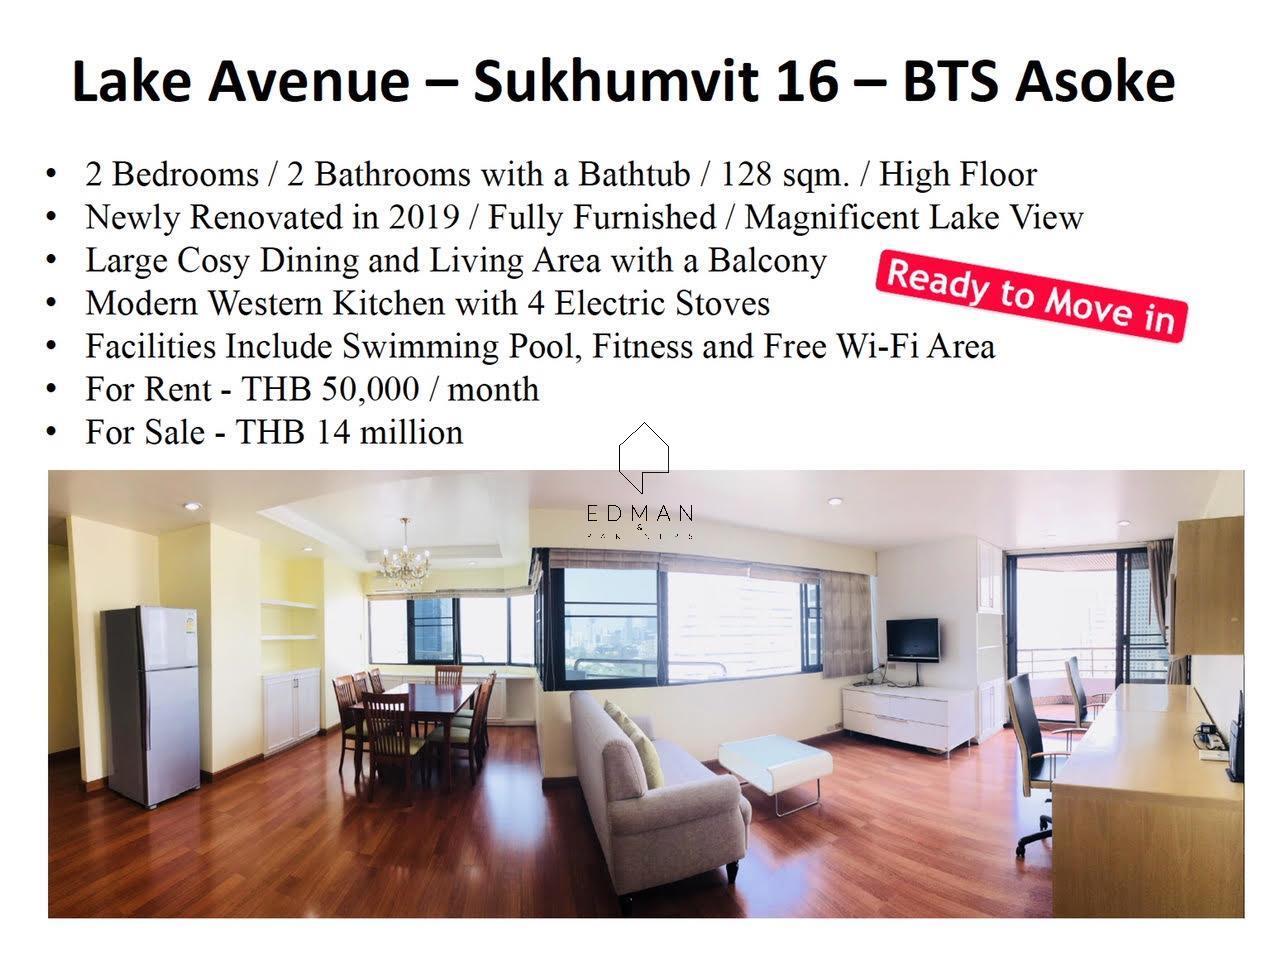 Edman and Partners Co.,Ltd Agency's Lake Avenue Condo Sukhumvit 16 -BTS Asoke 16